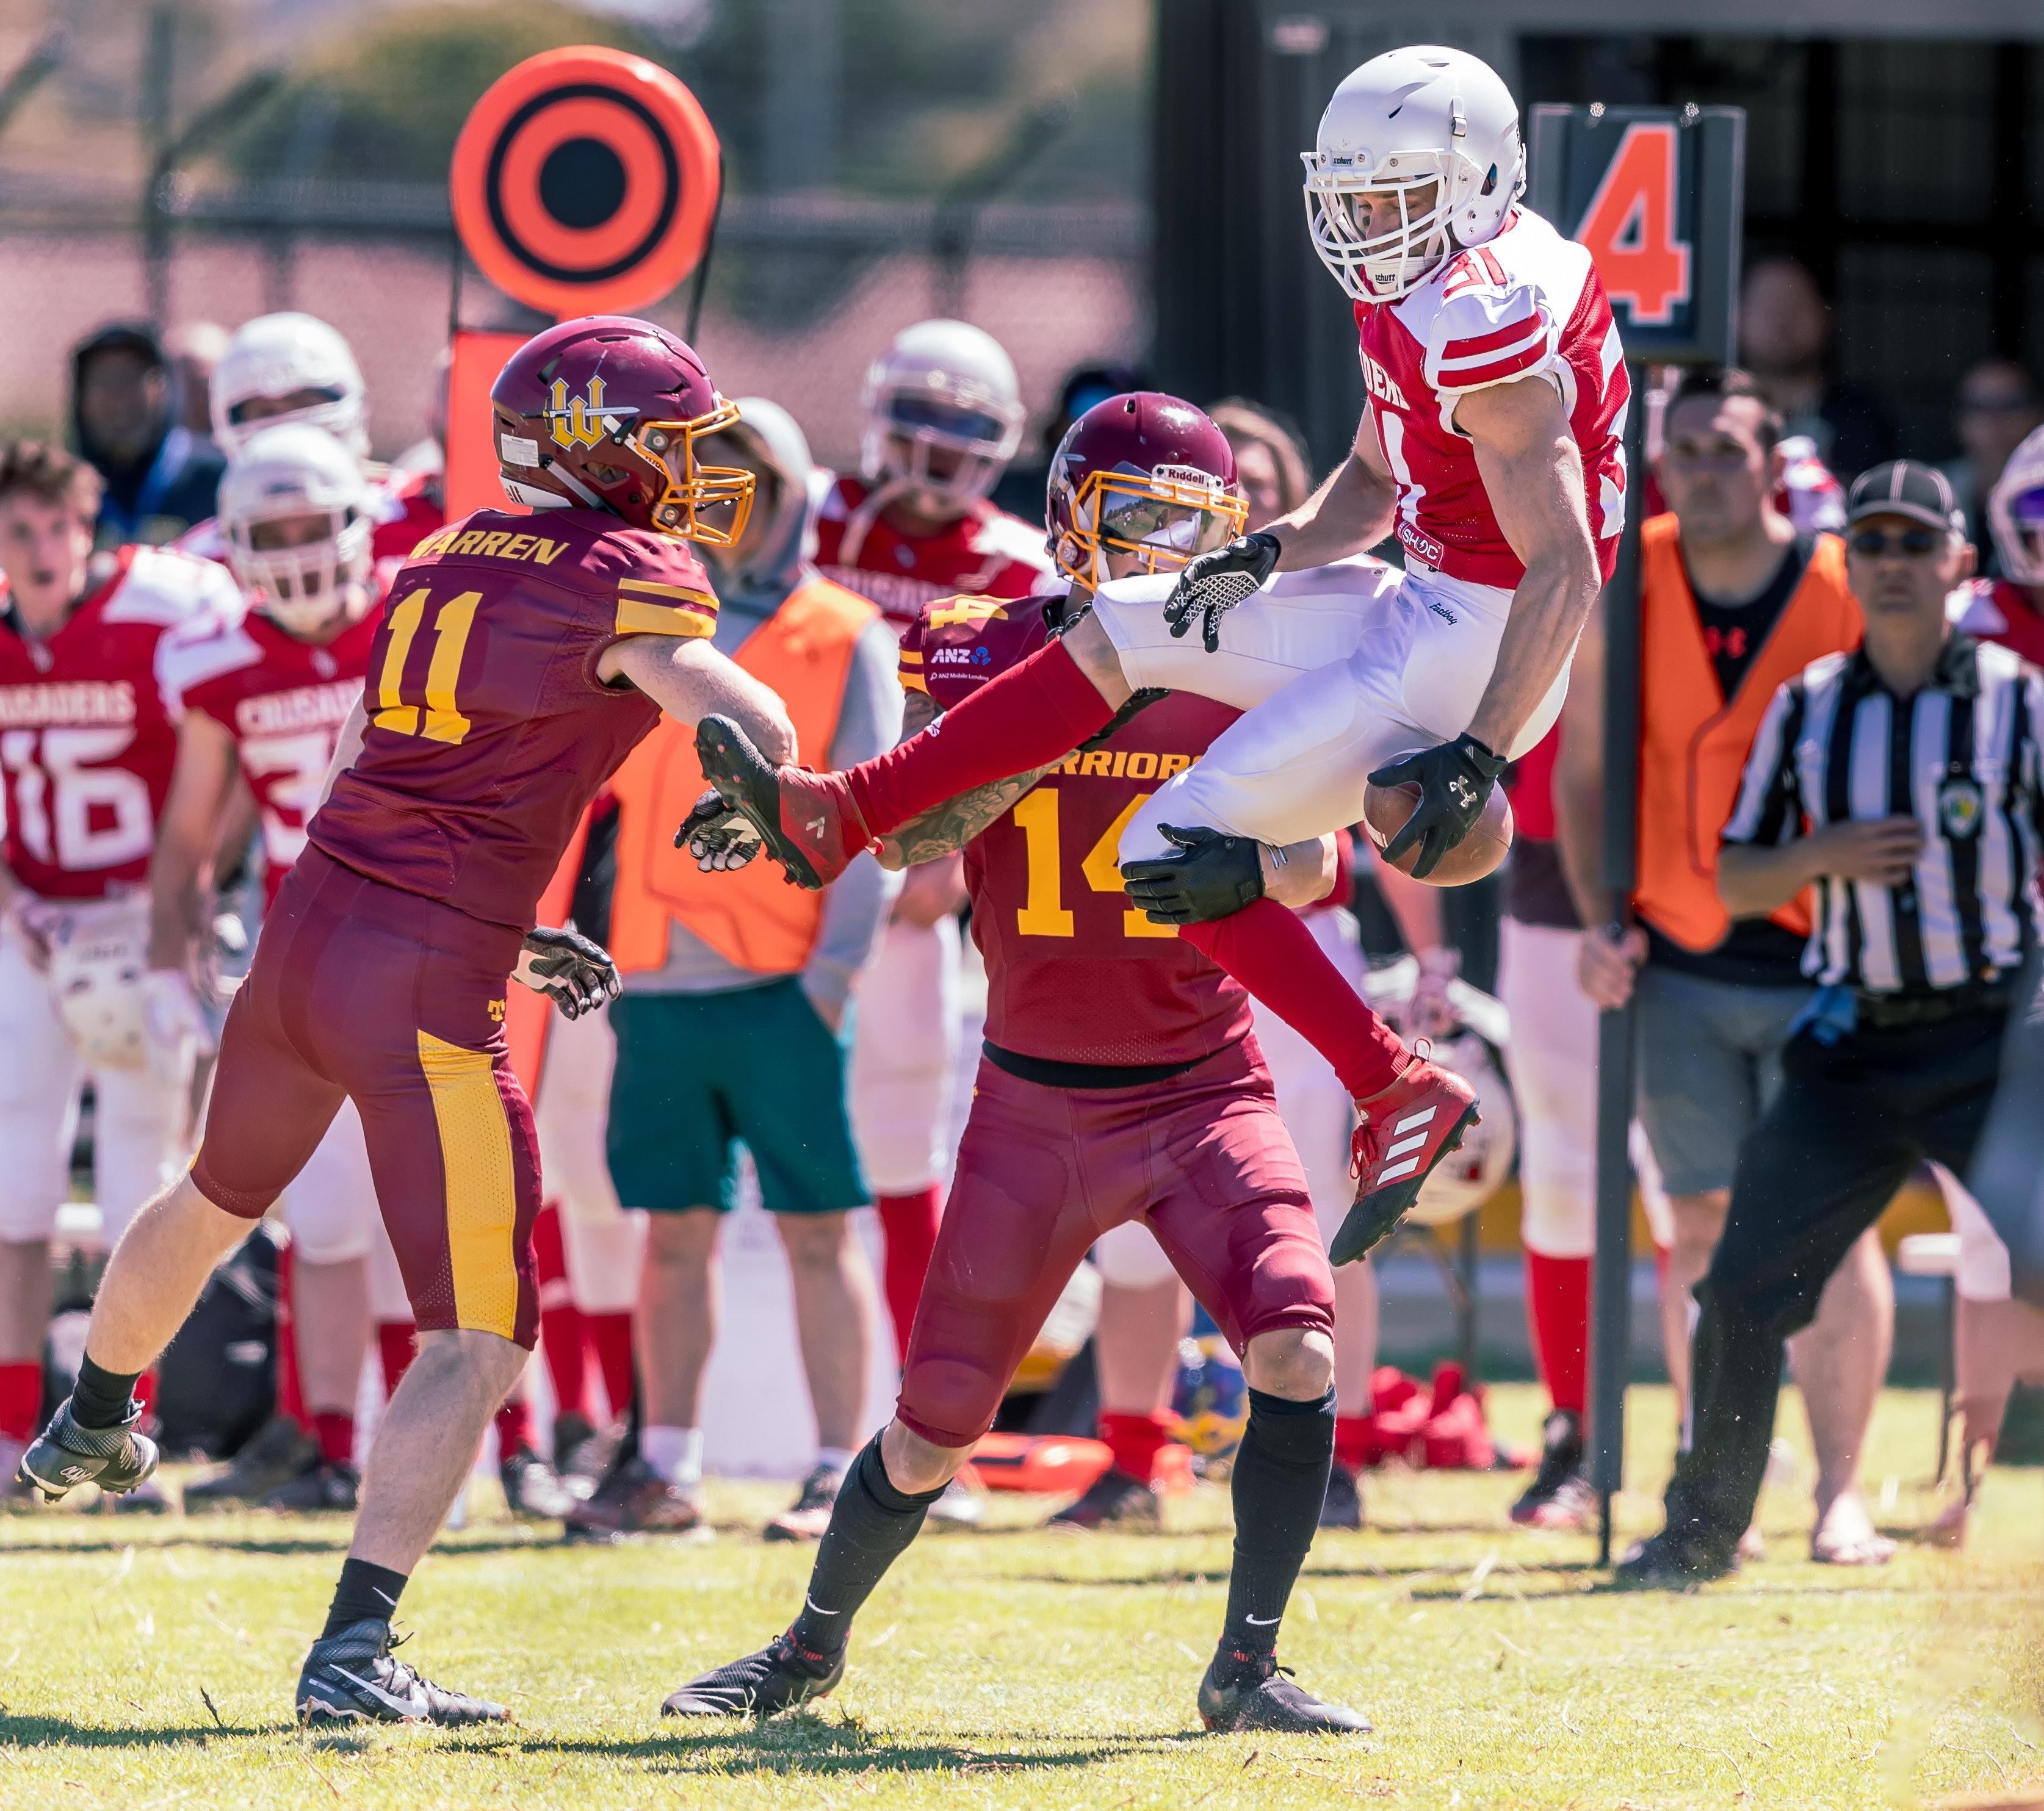 Fotos Gratis 2018 Vic Bowl Accion Atletas Pelota Futbol